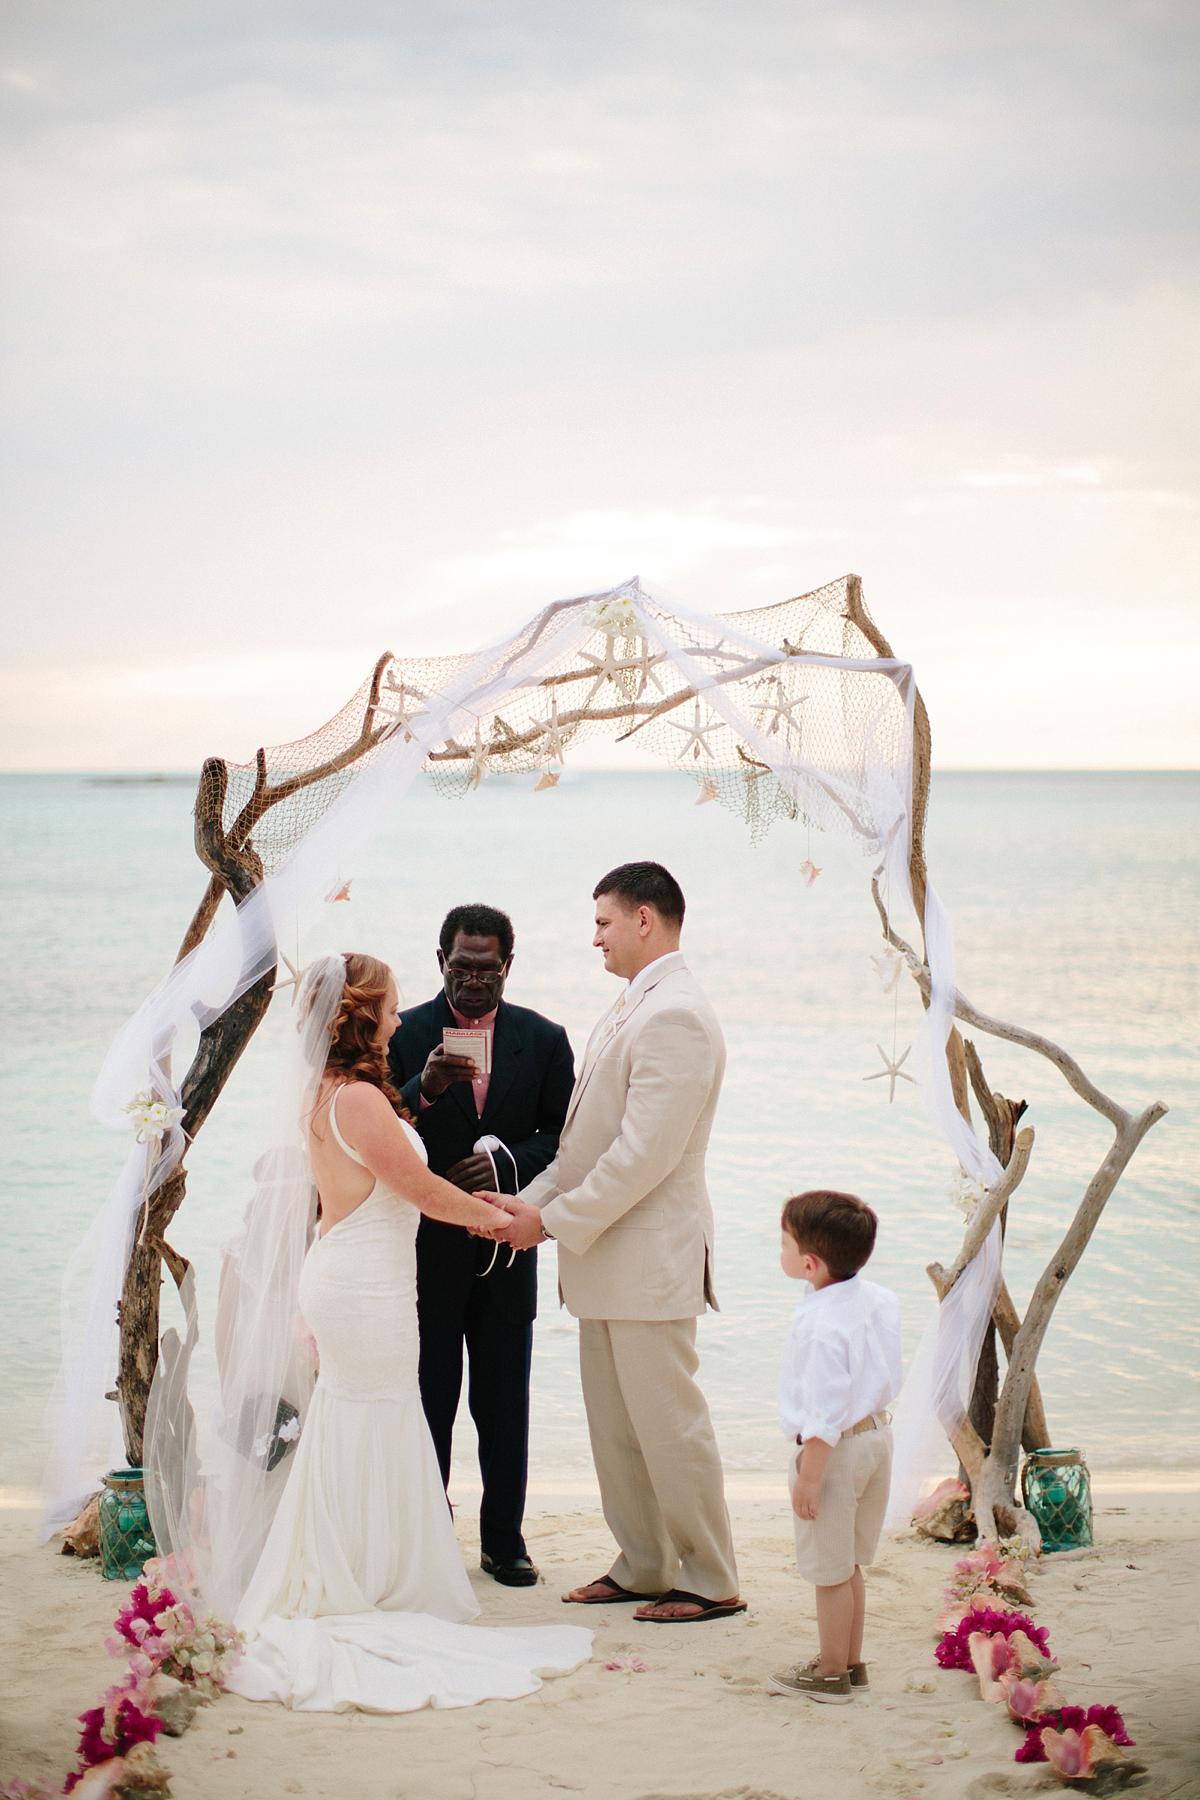 bahamas-destination-wedding-photographer-island-private-ceremony-staniel-cay_0028.jpg